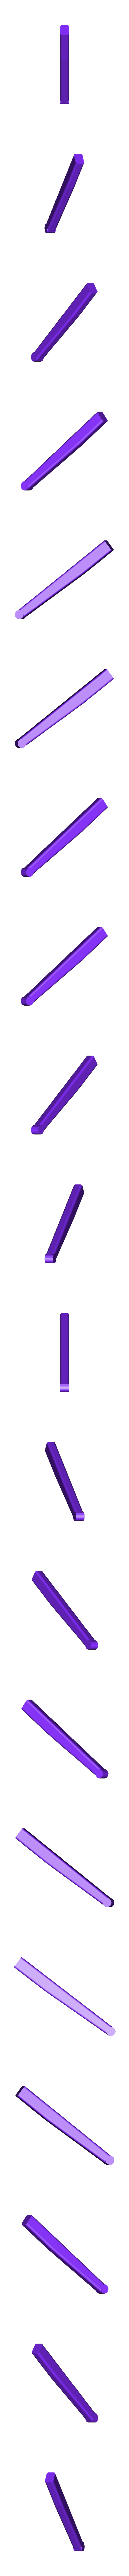 11 - NOSE STRUT.stl Download STL file DOUGLAS F4D SKYRAY  • 3D printer object, 3DprintedArmy